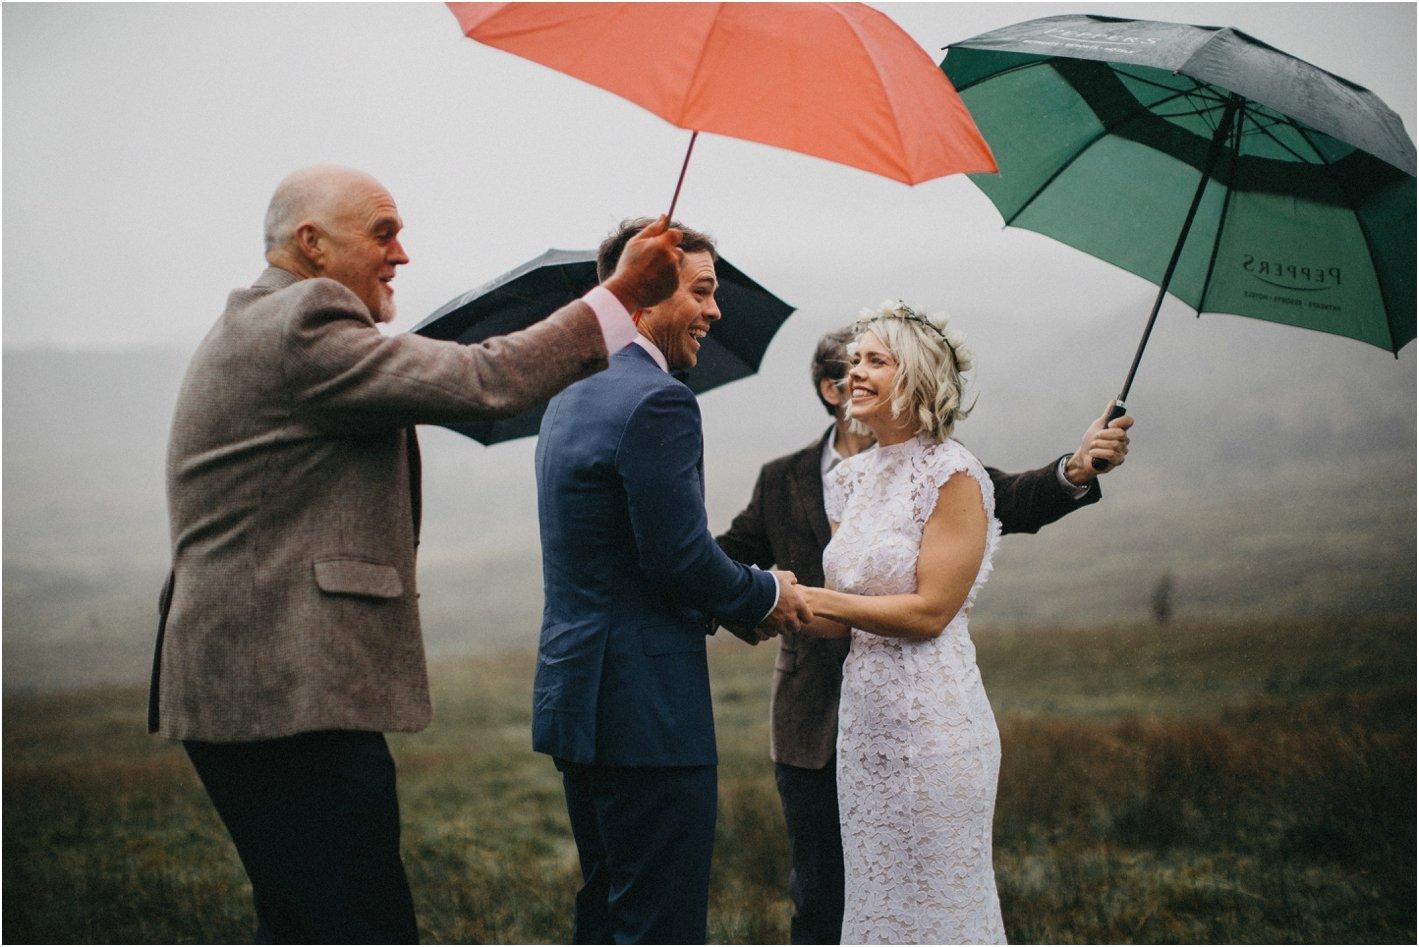 How to elope in Australia